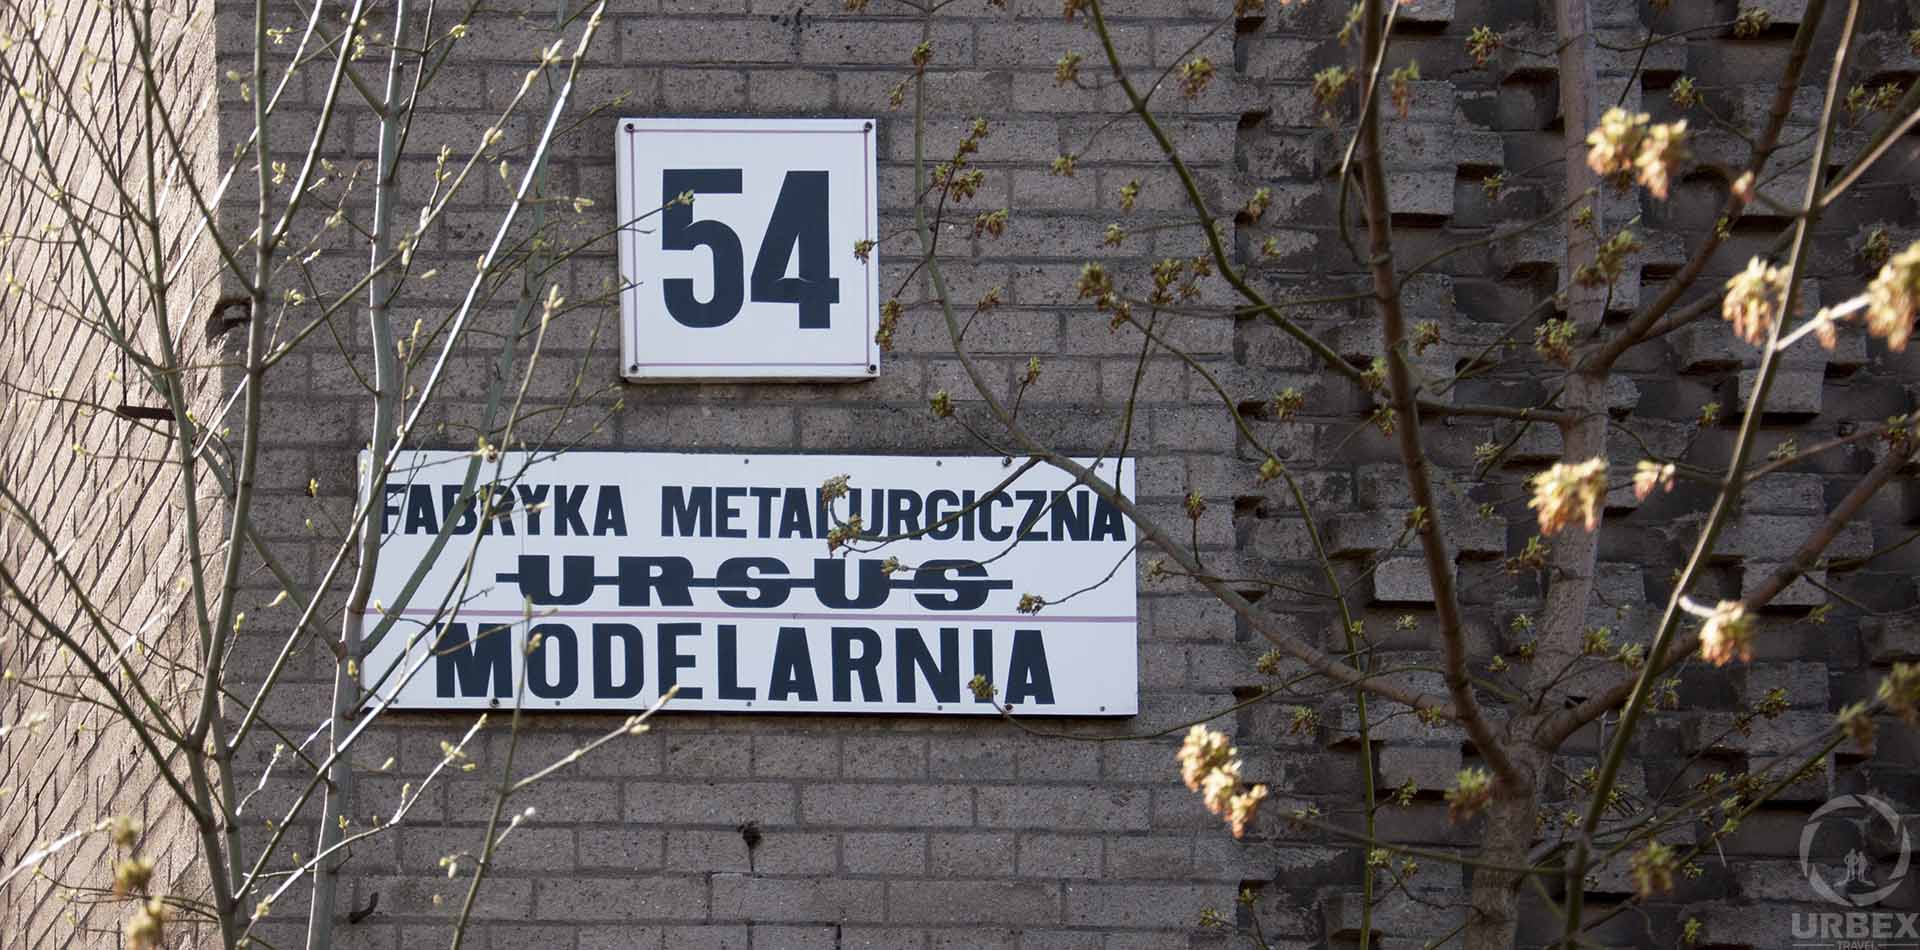 inside abandoned Ursus factory in Warsaw